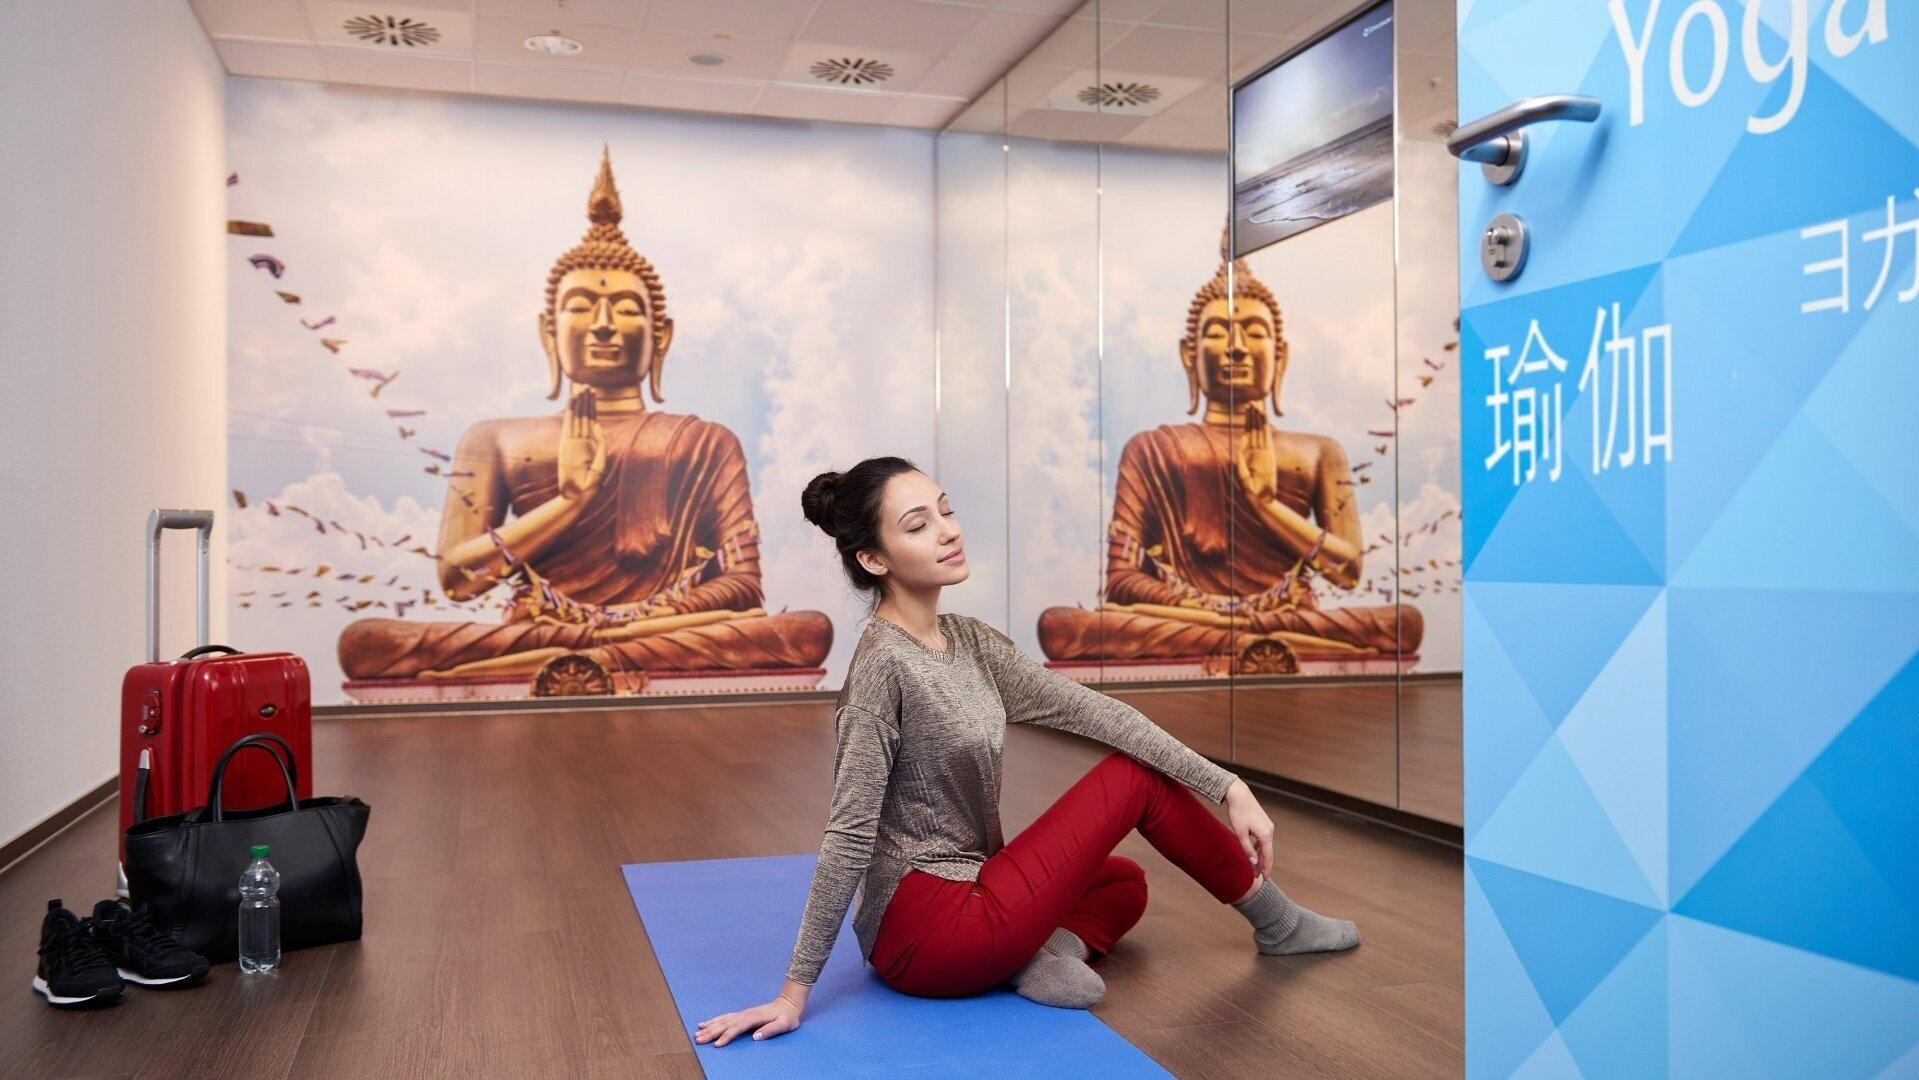 Image from  https://shop.frankfurt-airport.com/en/service/yoga-raum